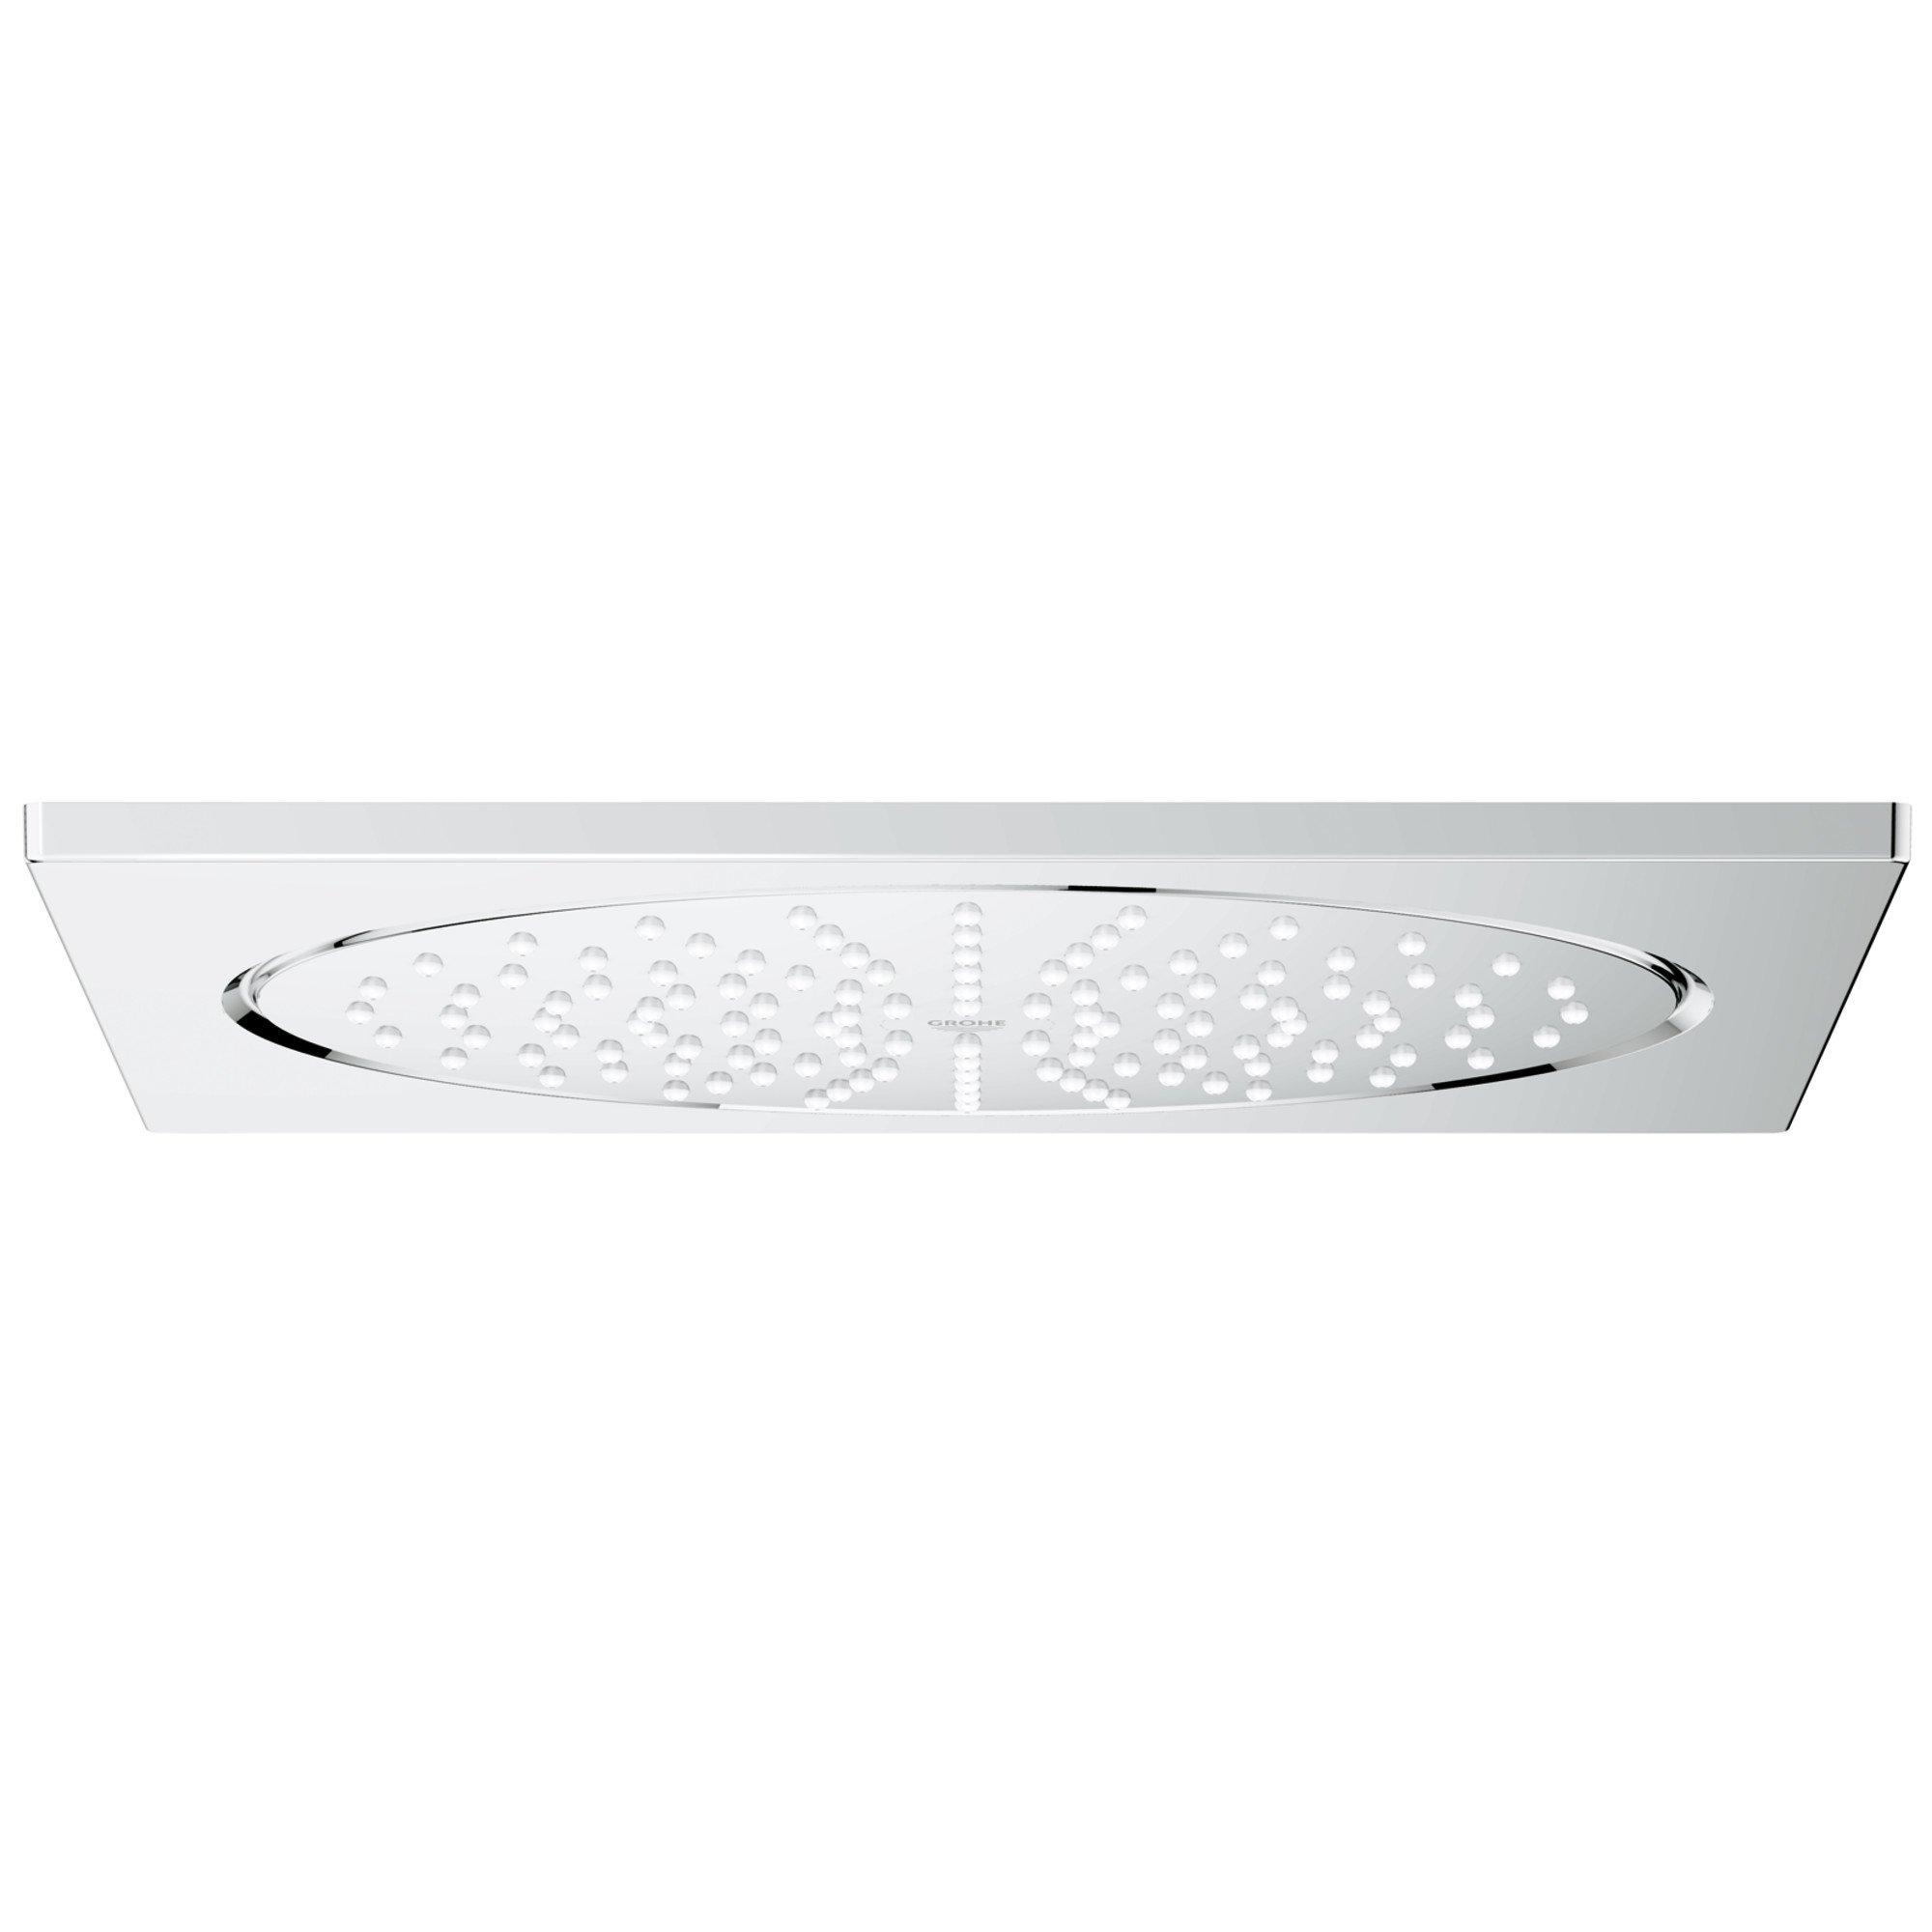 GROHE 27816000 Rainshower F-Series 10'' Ceiling Shower head